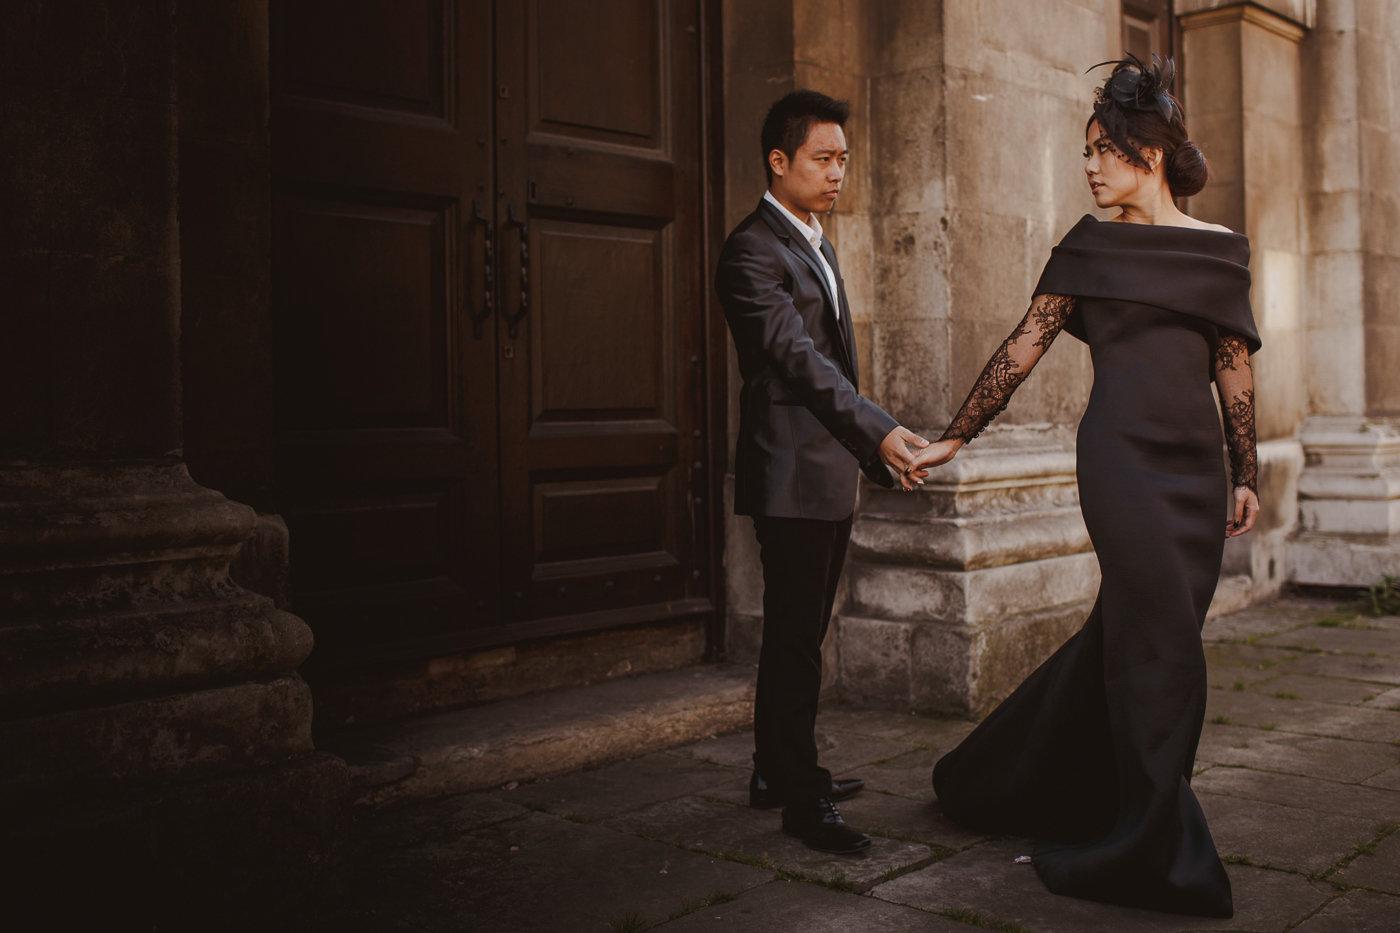 pre-wedding-photography-london-5.jpg